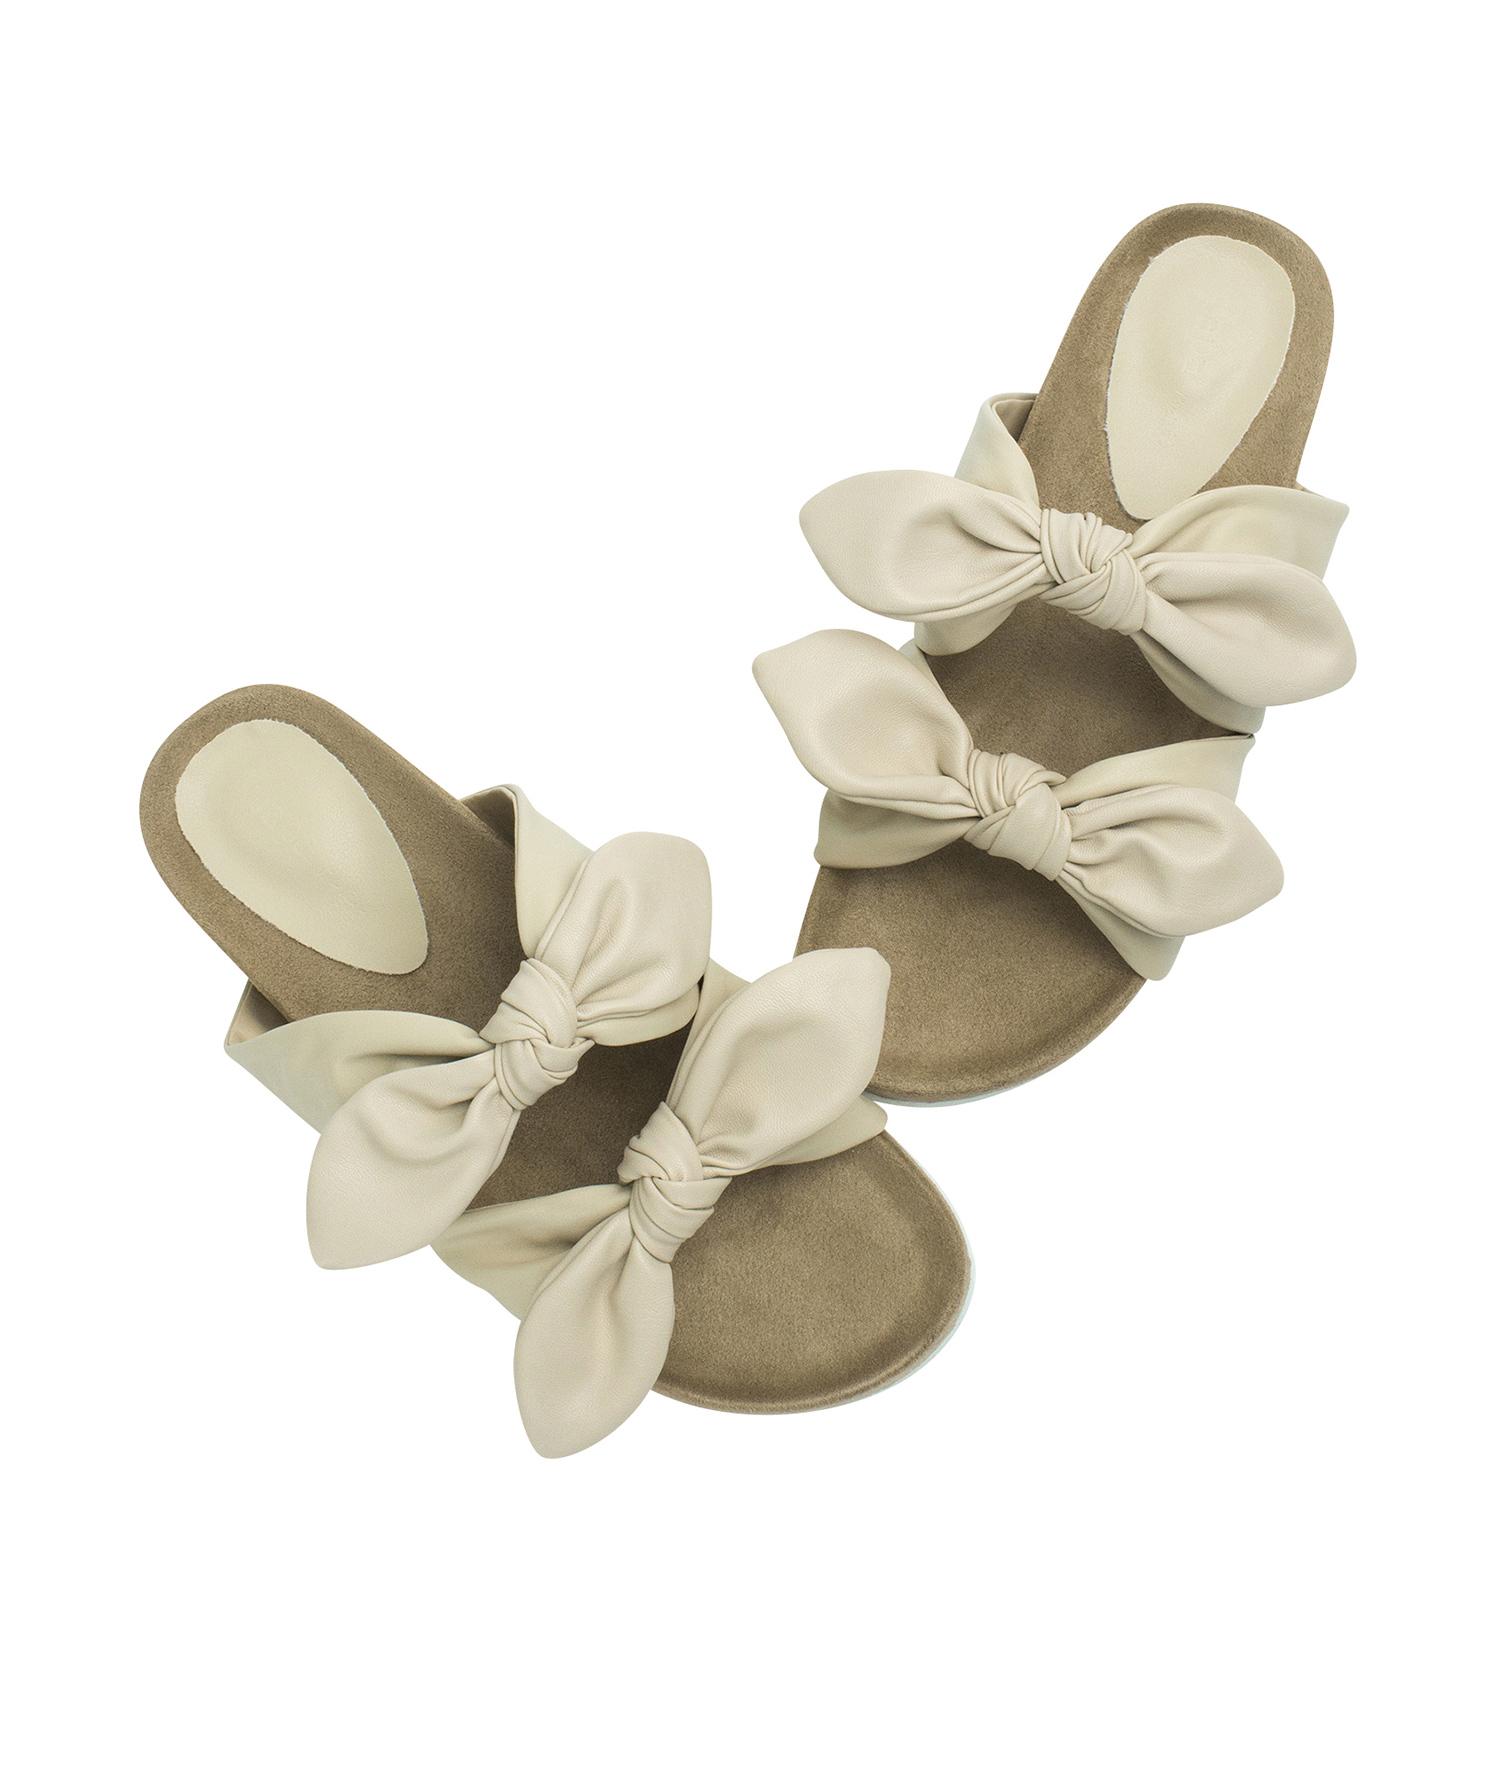 1dedaafa4 AnnaKastle Womens Double Knotted Bow Slide Sandals Beige